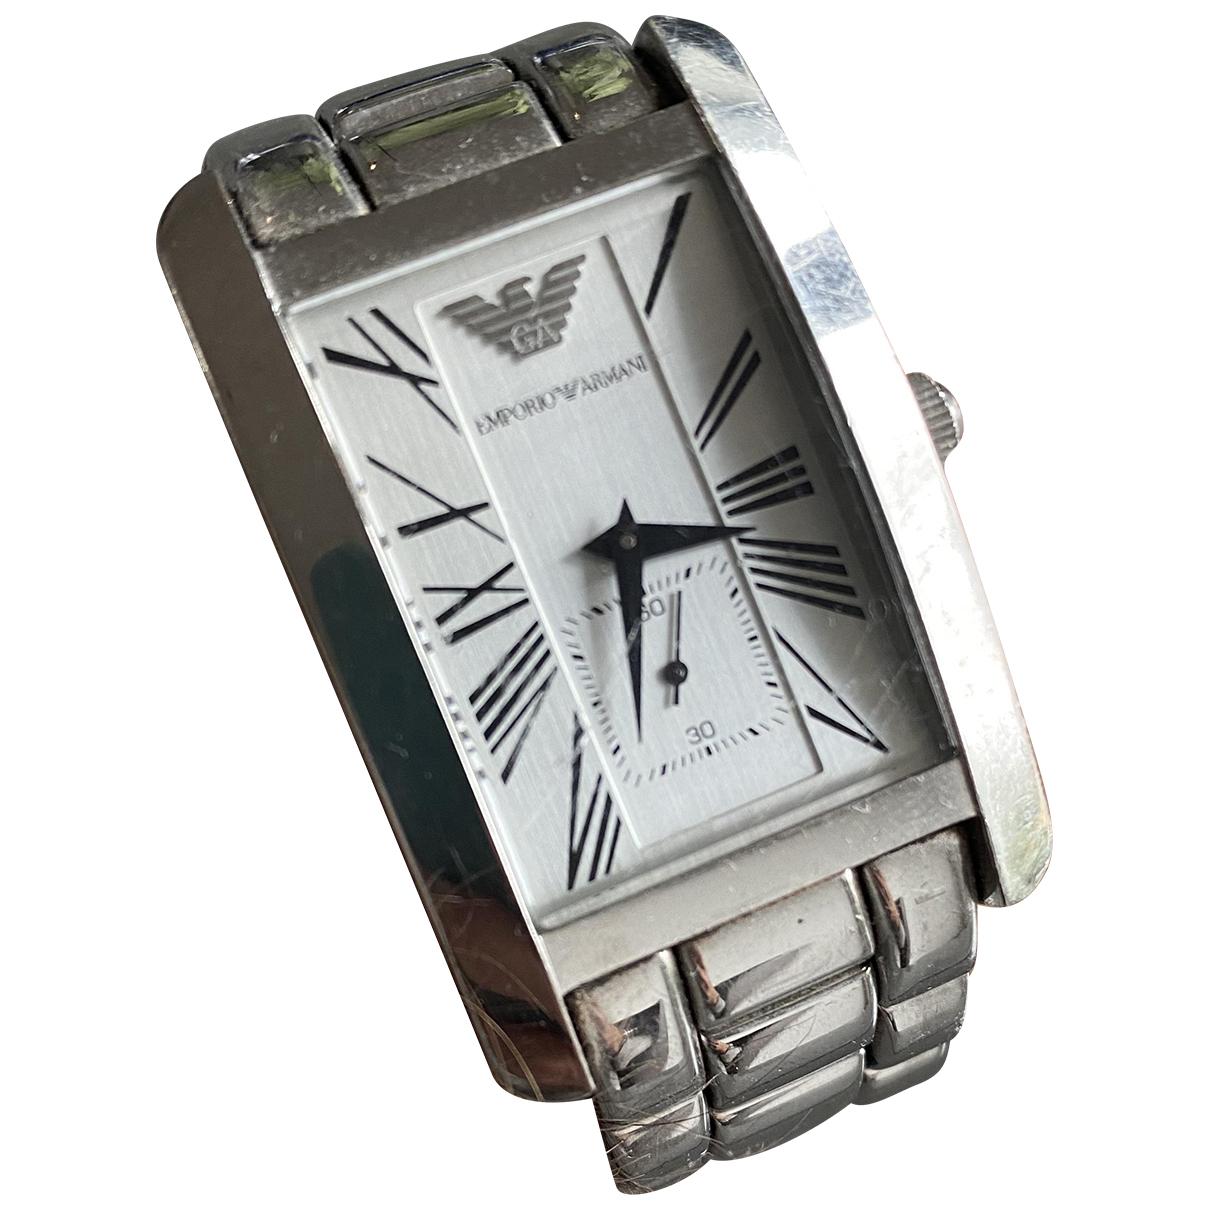 Emporio Armani N Silver Steel watch for Men N